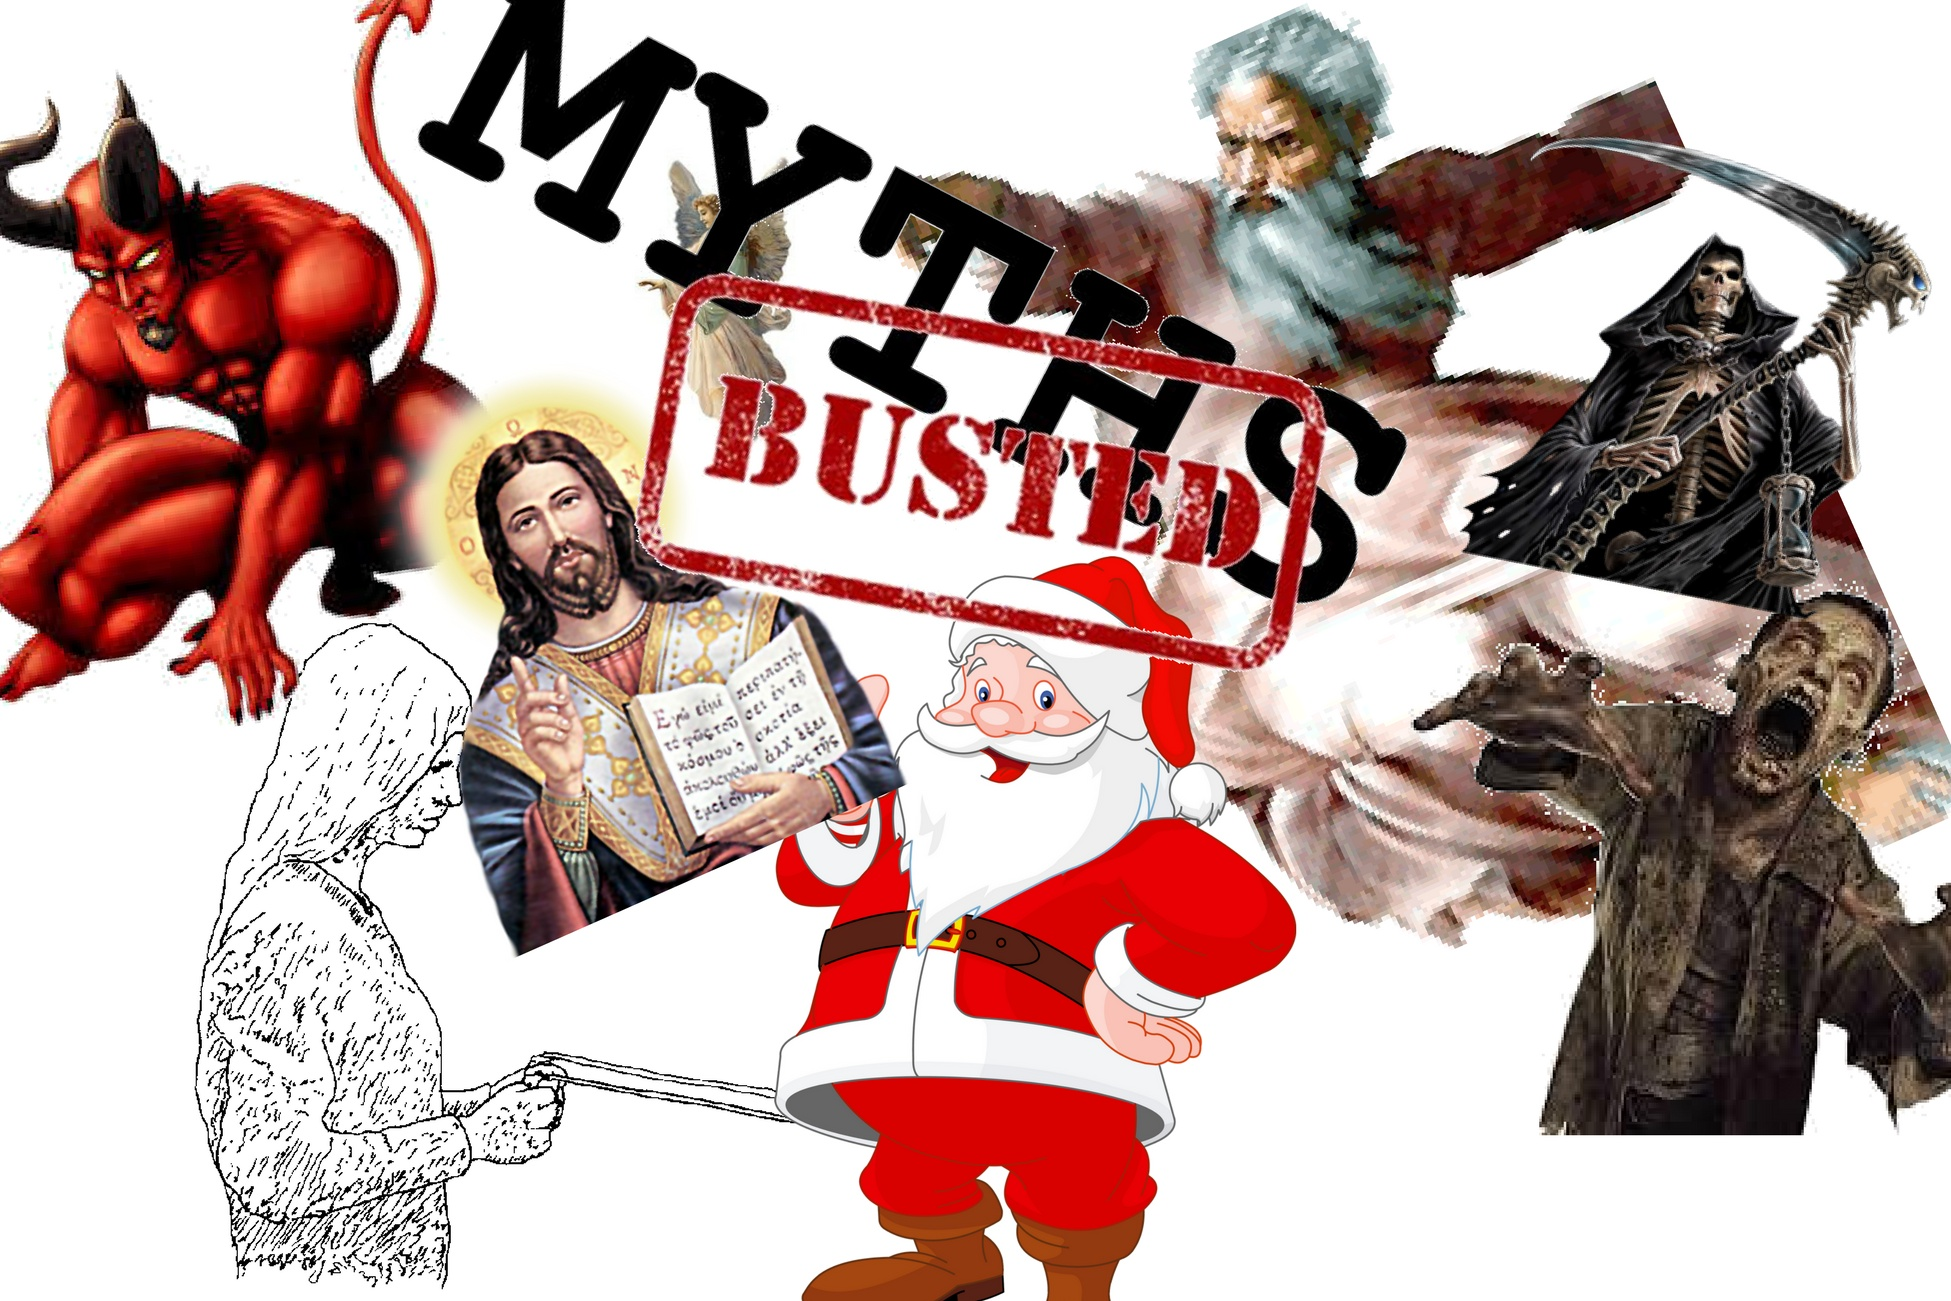 mythicist